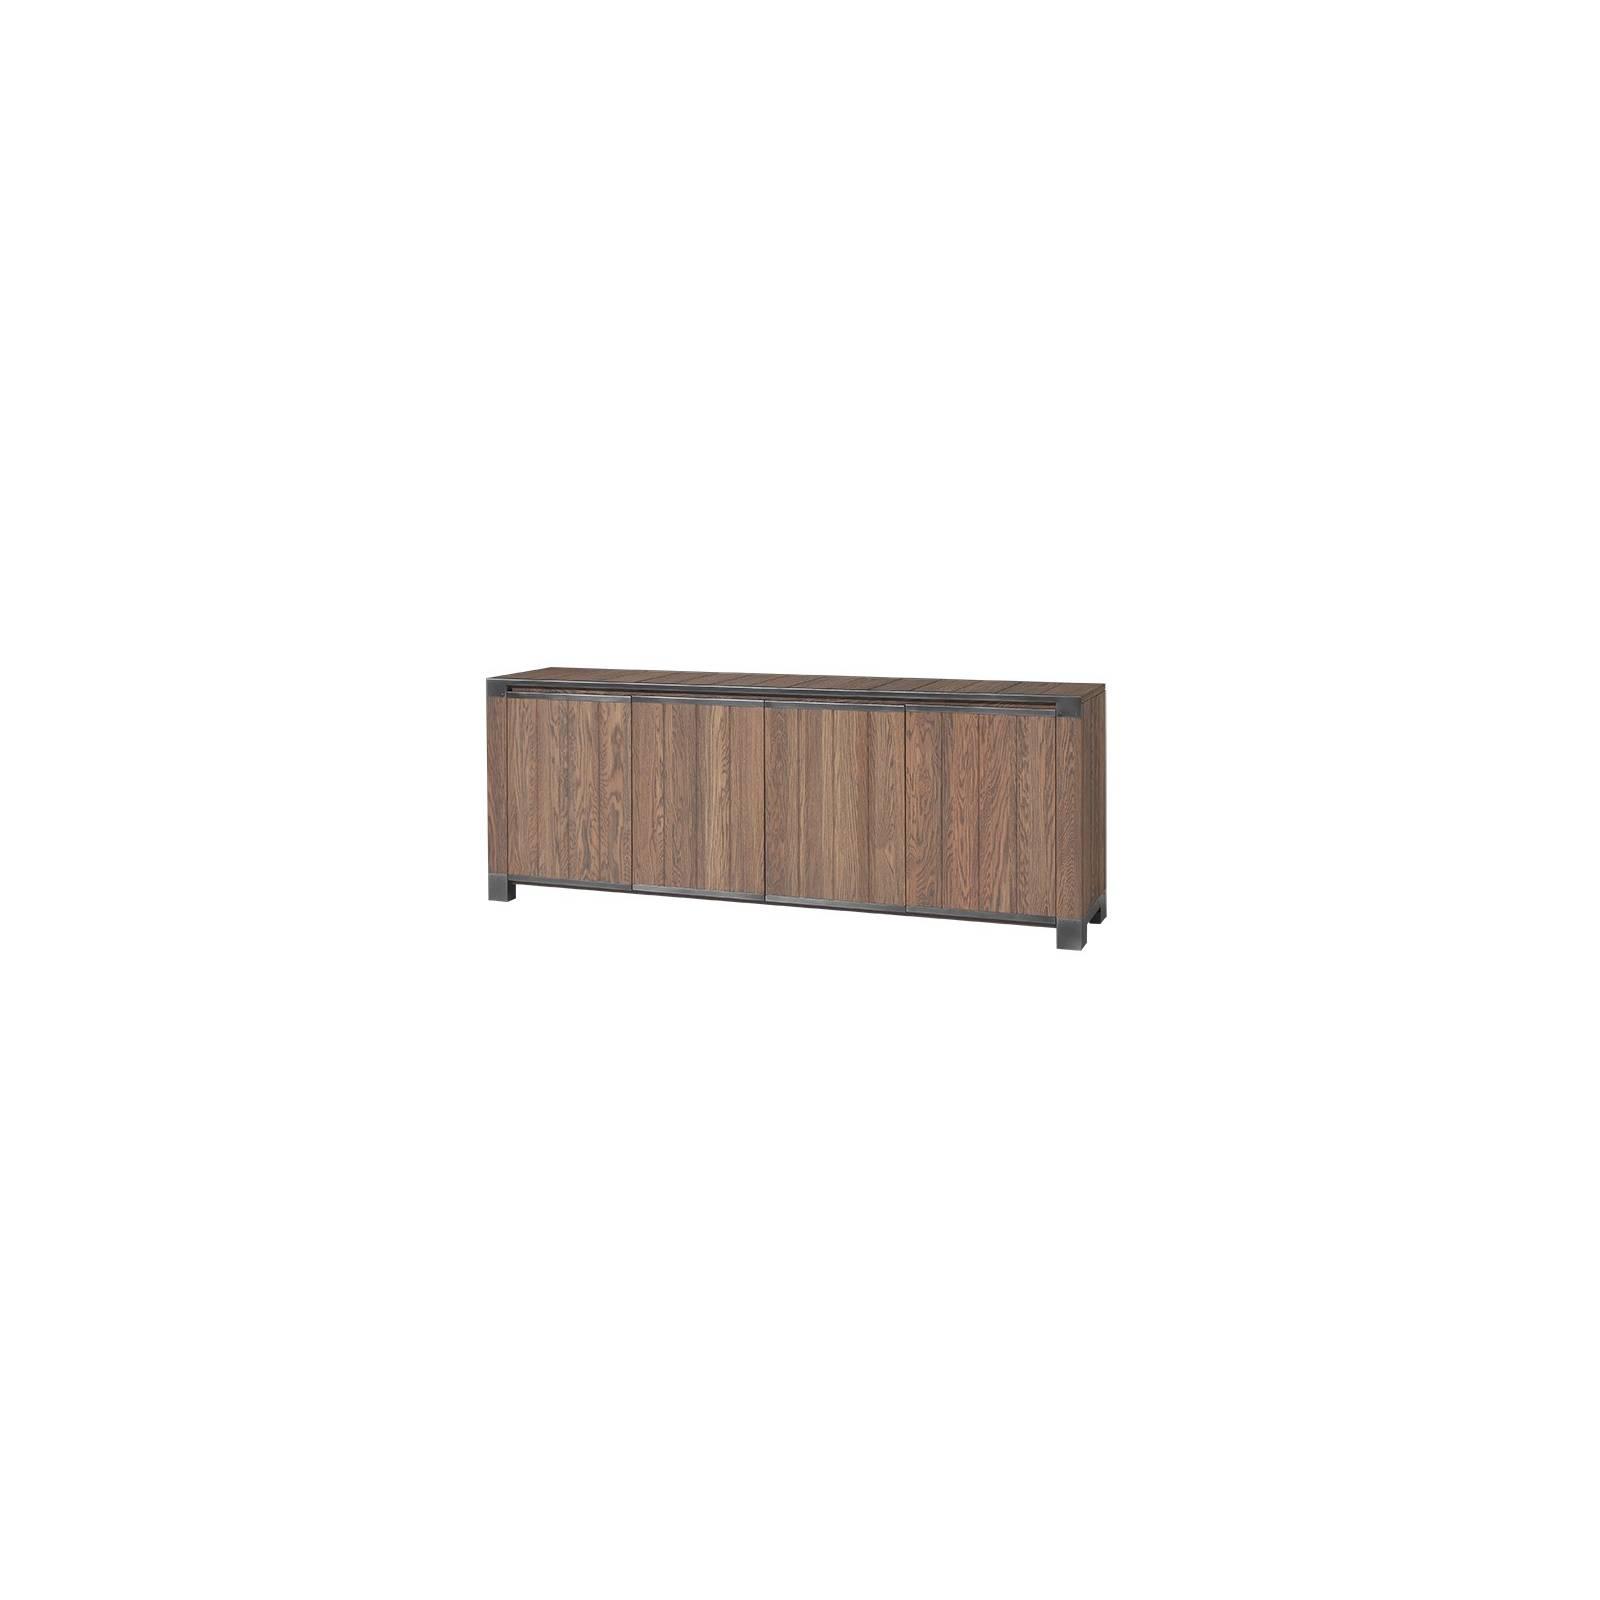 Buffet Grand Modèle Bas Toscan Chêne - mobilier haut de gamme